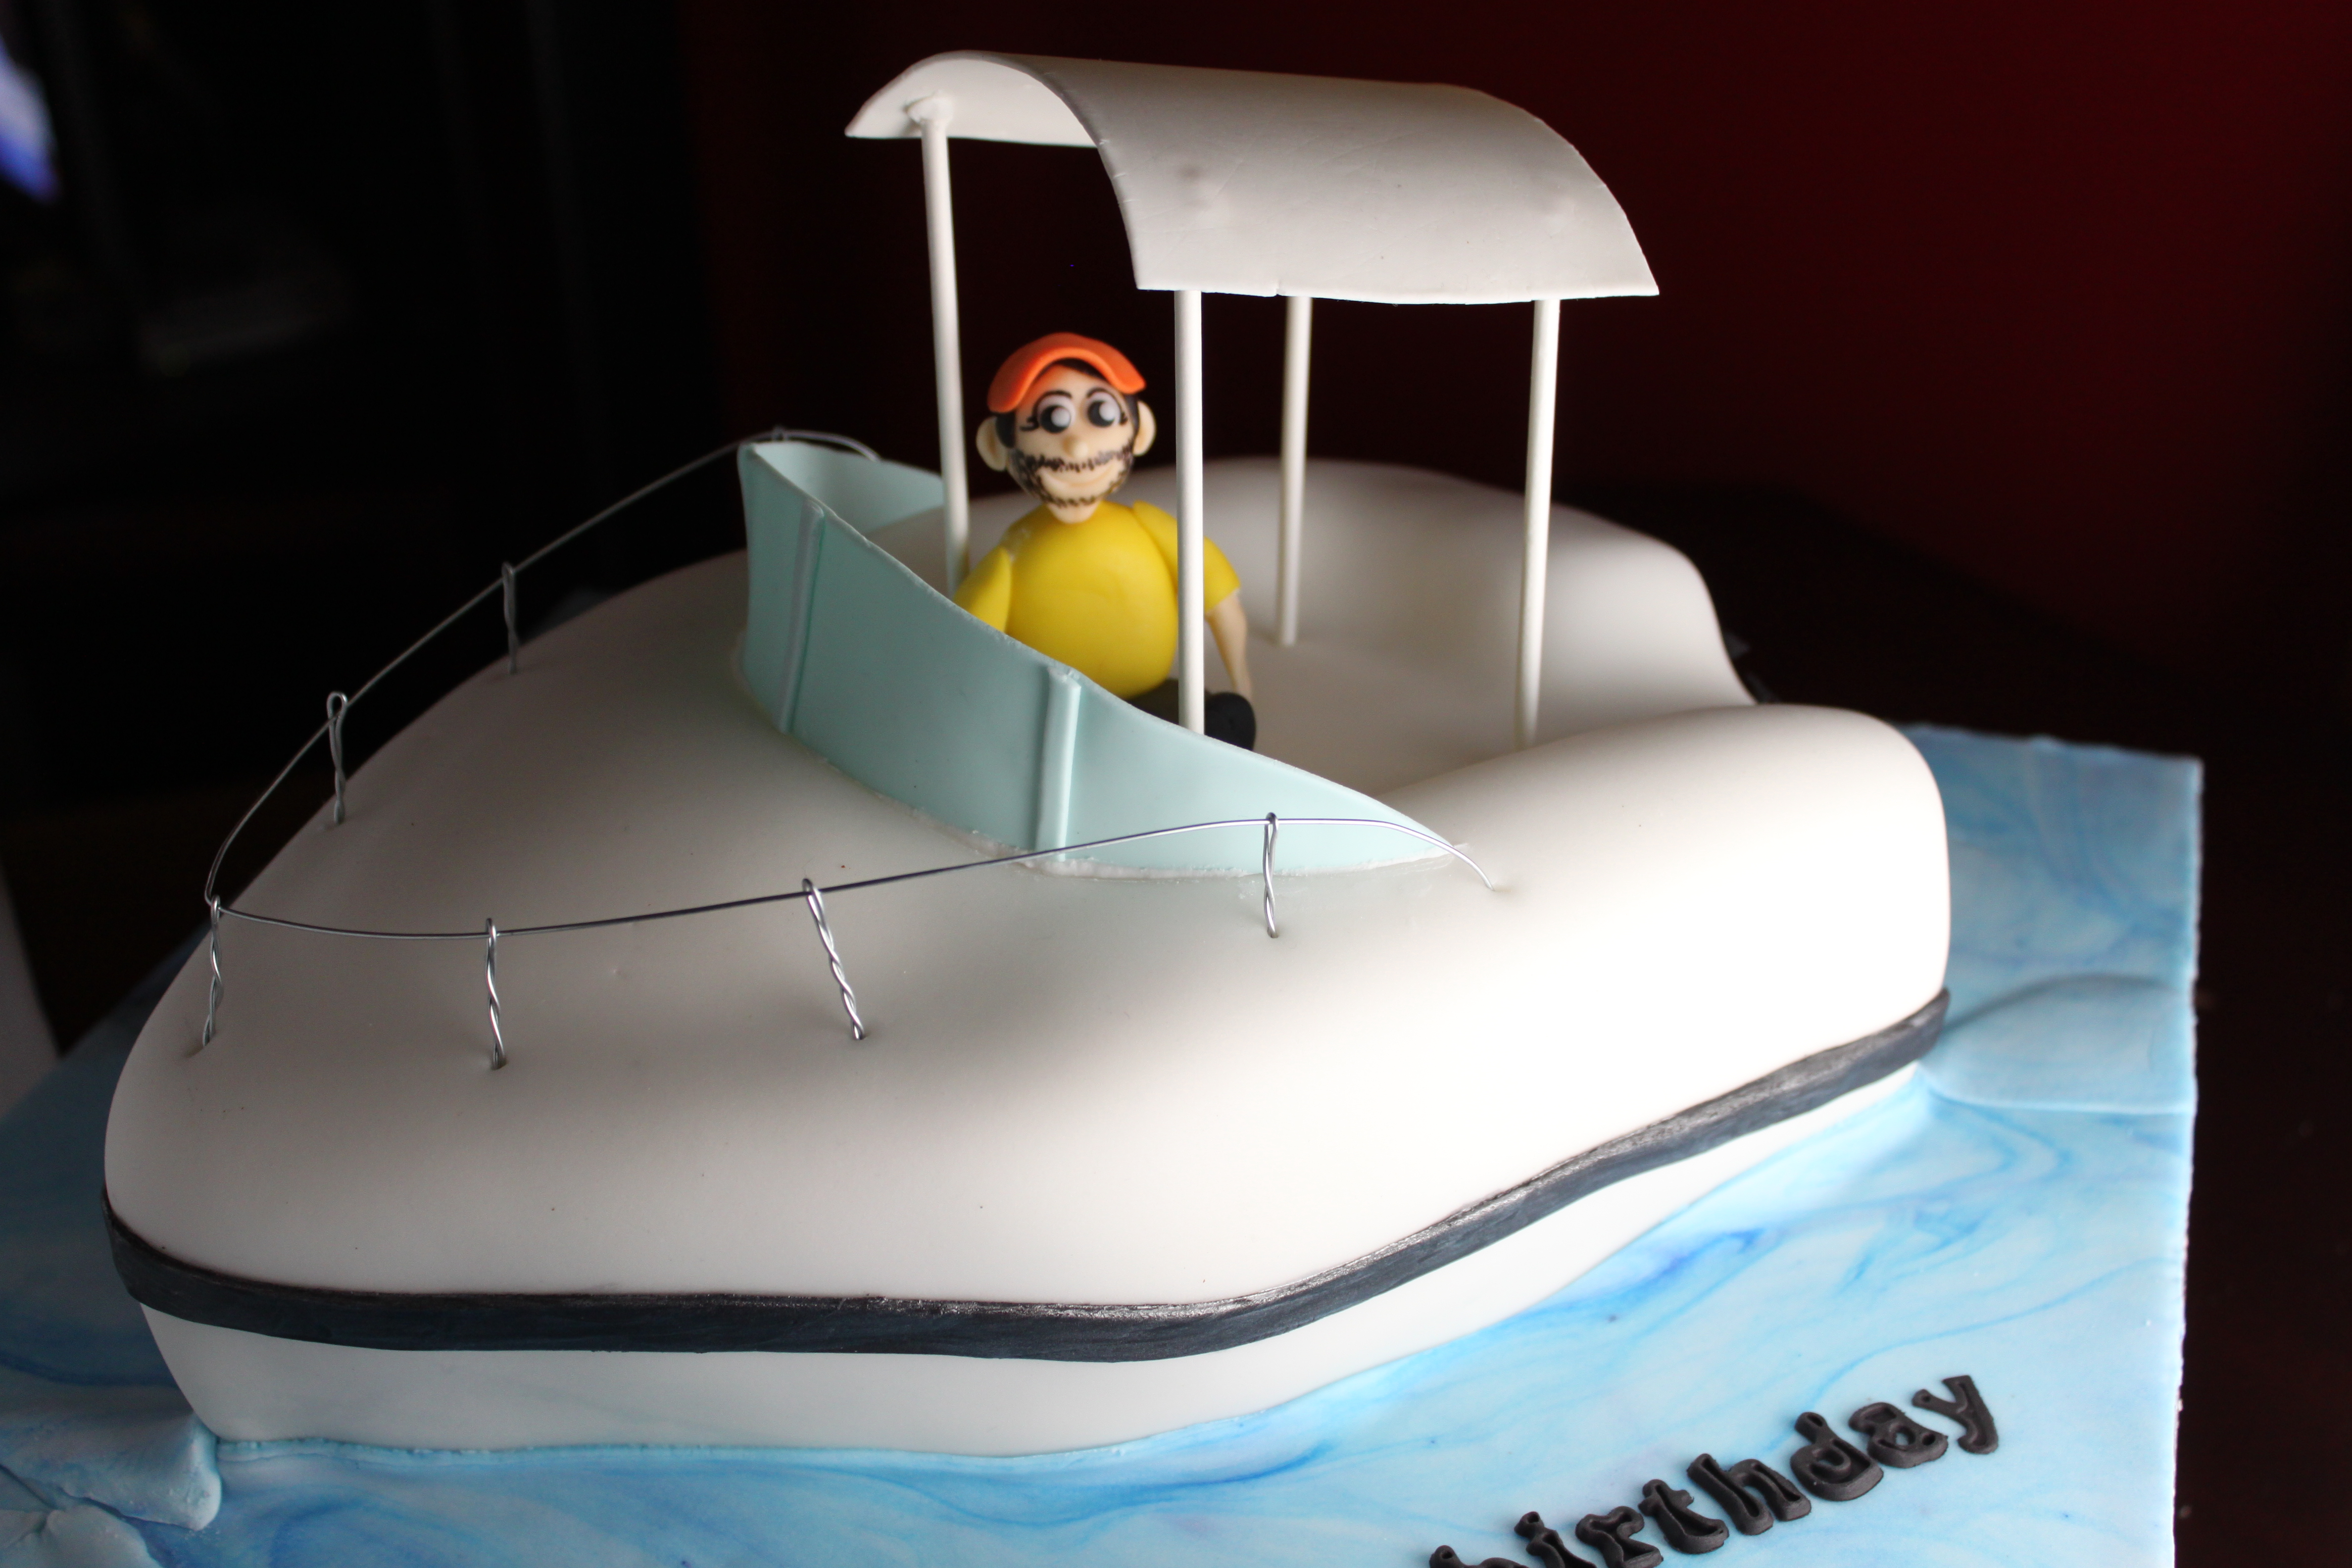 Fishing Boat Cake Lil Miss Cakes - Fishing boat birthday cake